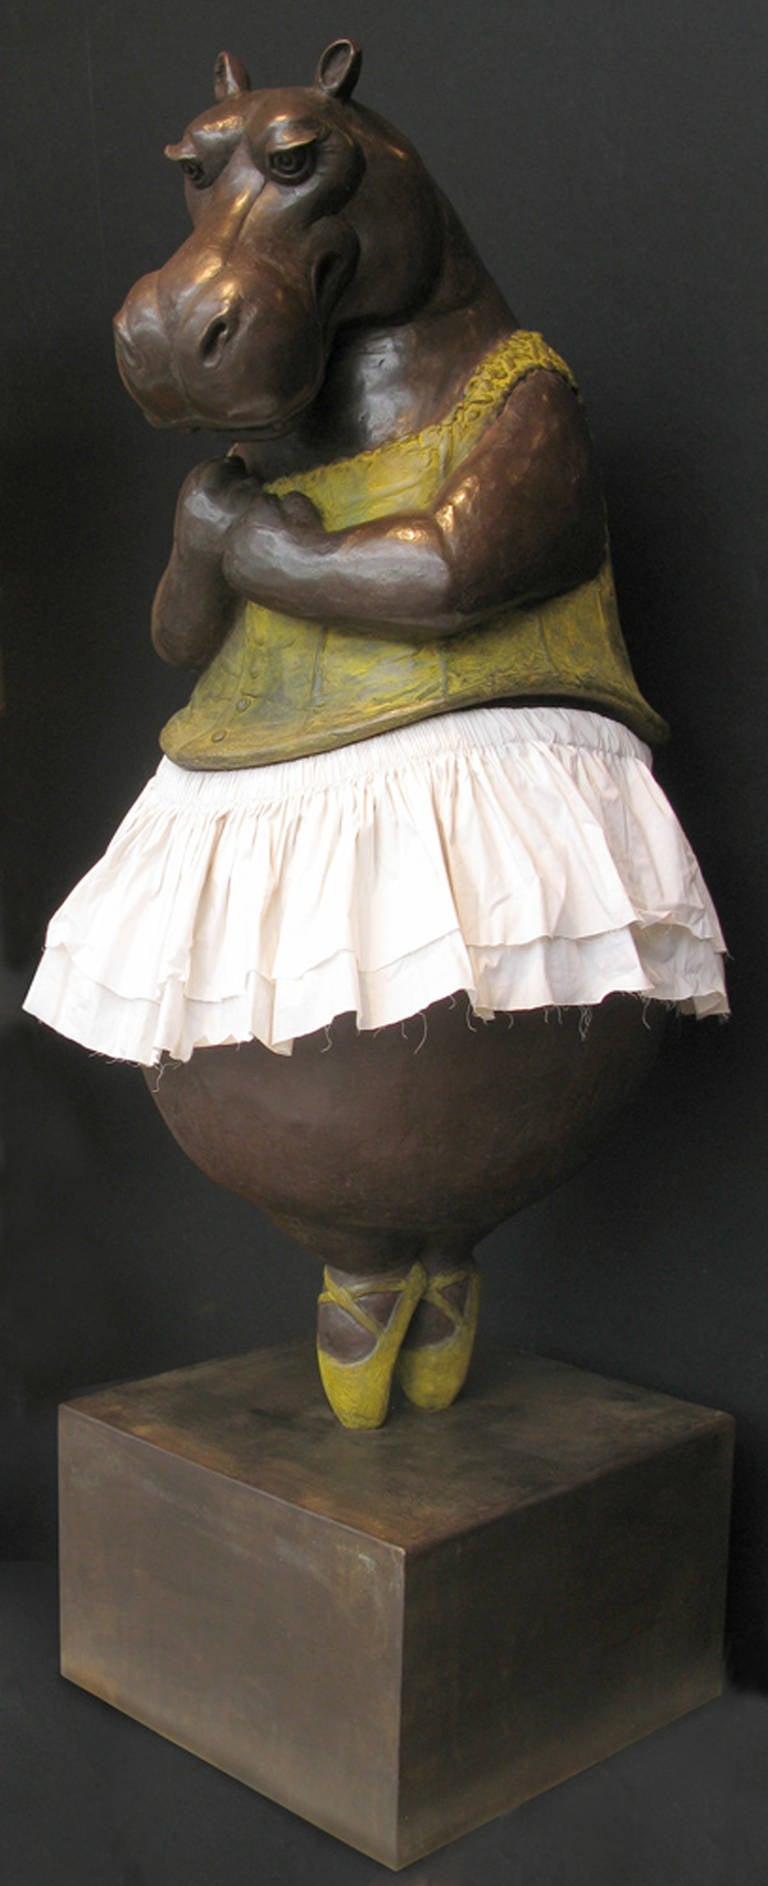 Bjorn Skaarup - Hippo Ballerina, en pointe 1